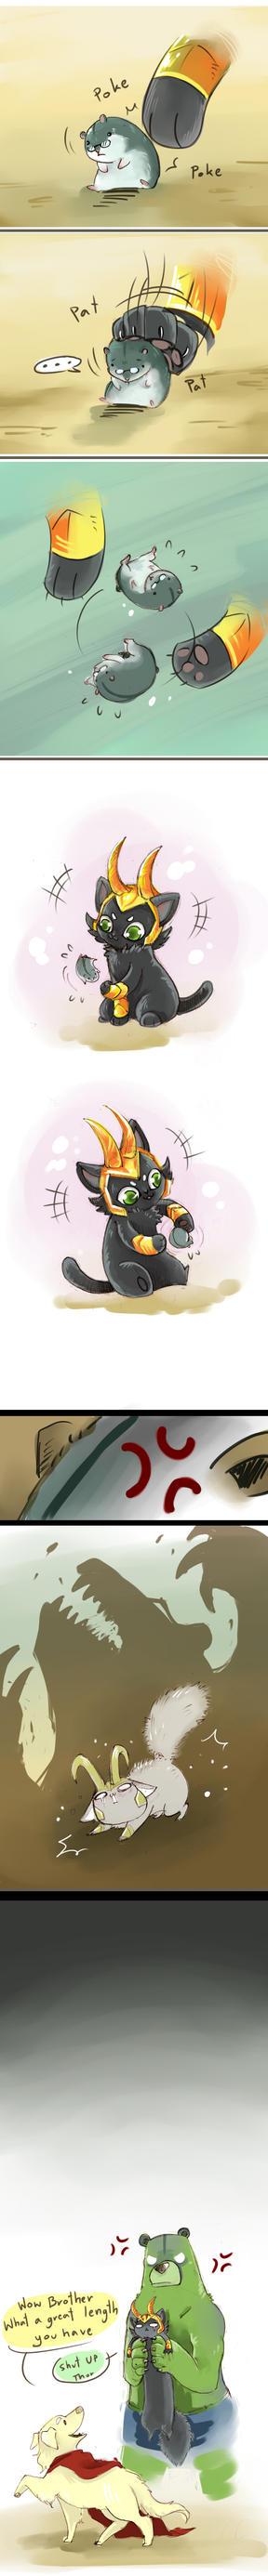 DogThor CatLoki: puny thing by LittleDarkDragon